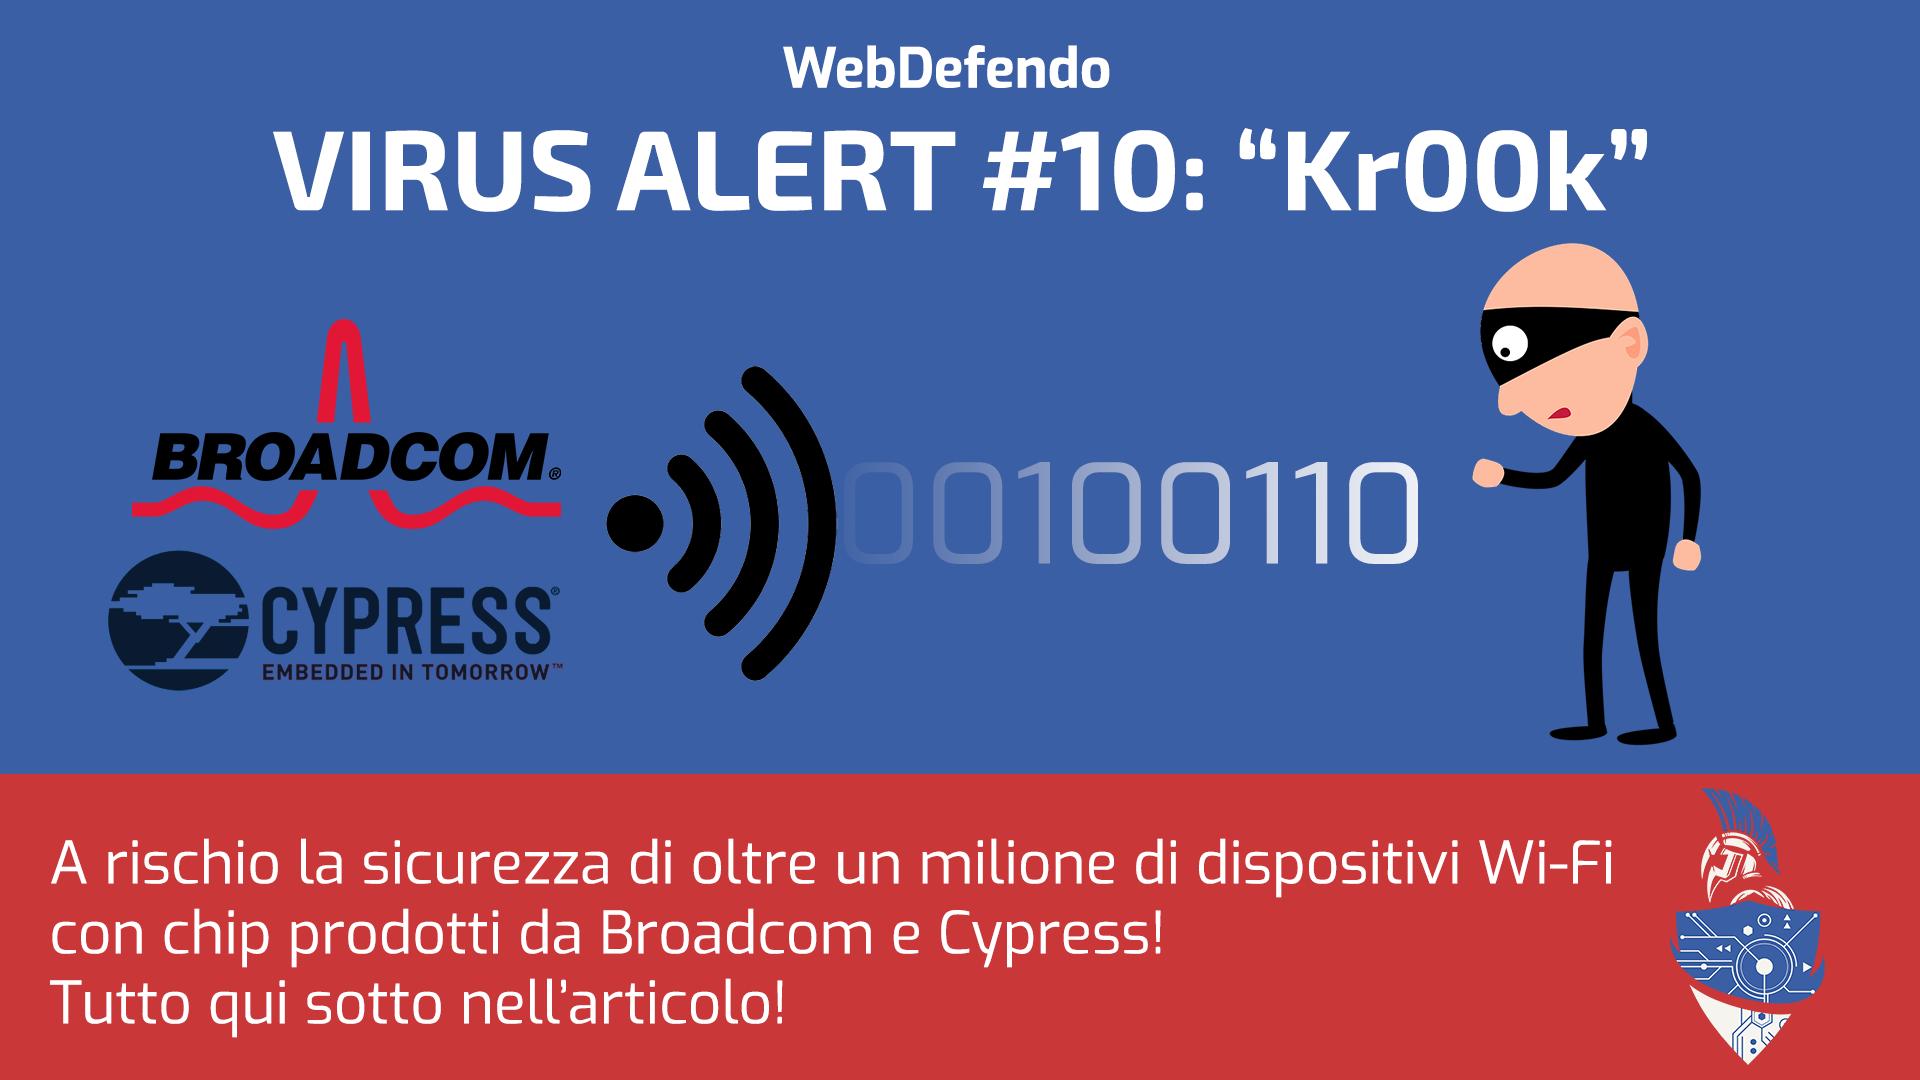 Kr00k - a rischio dispositivi WiFi!